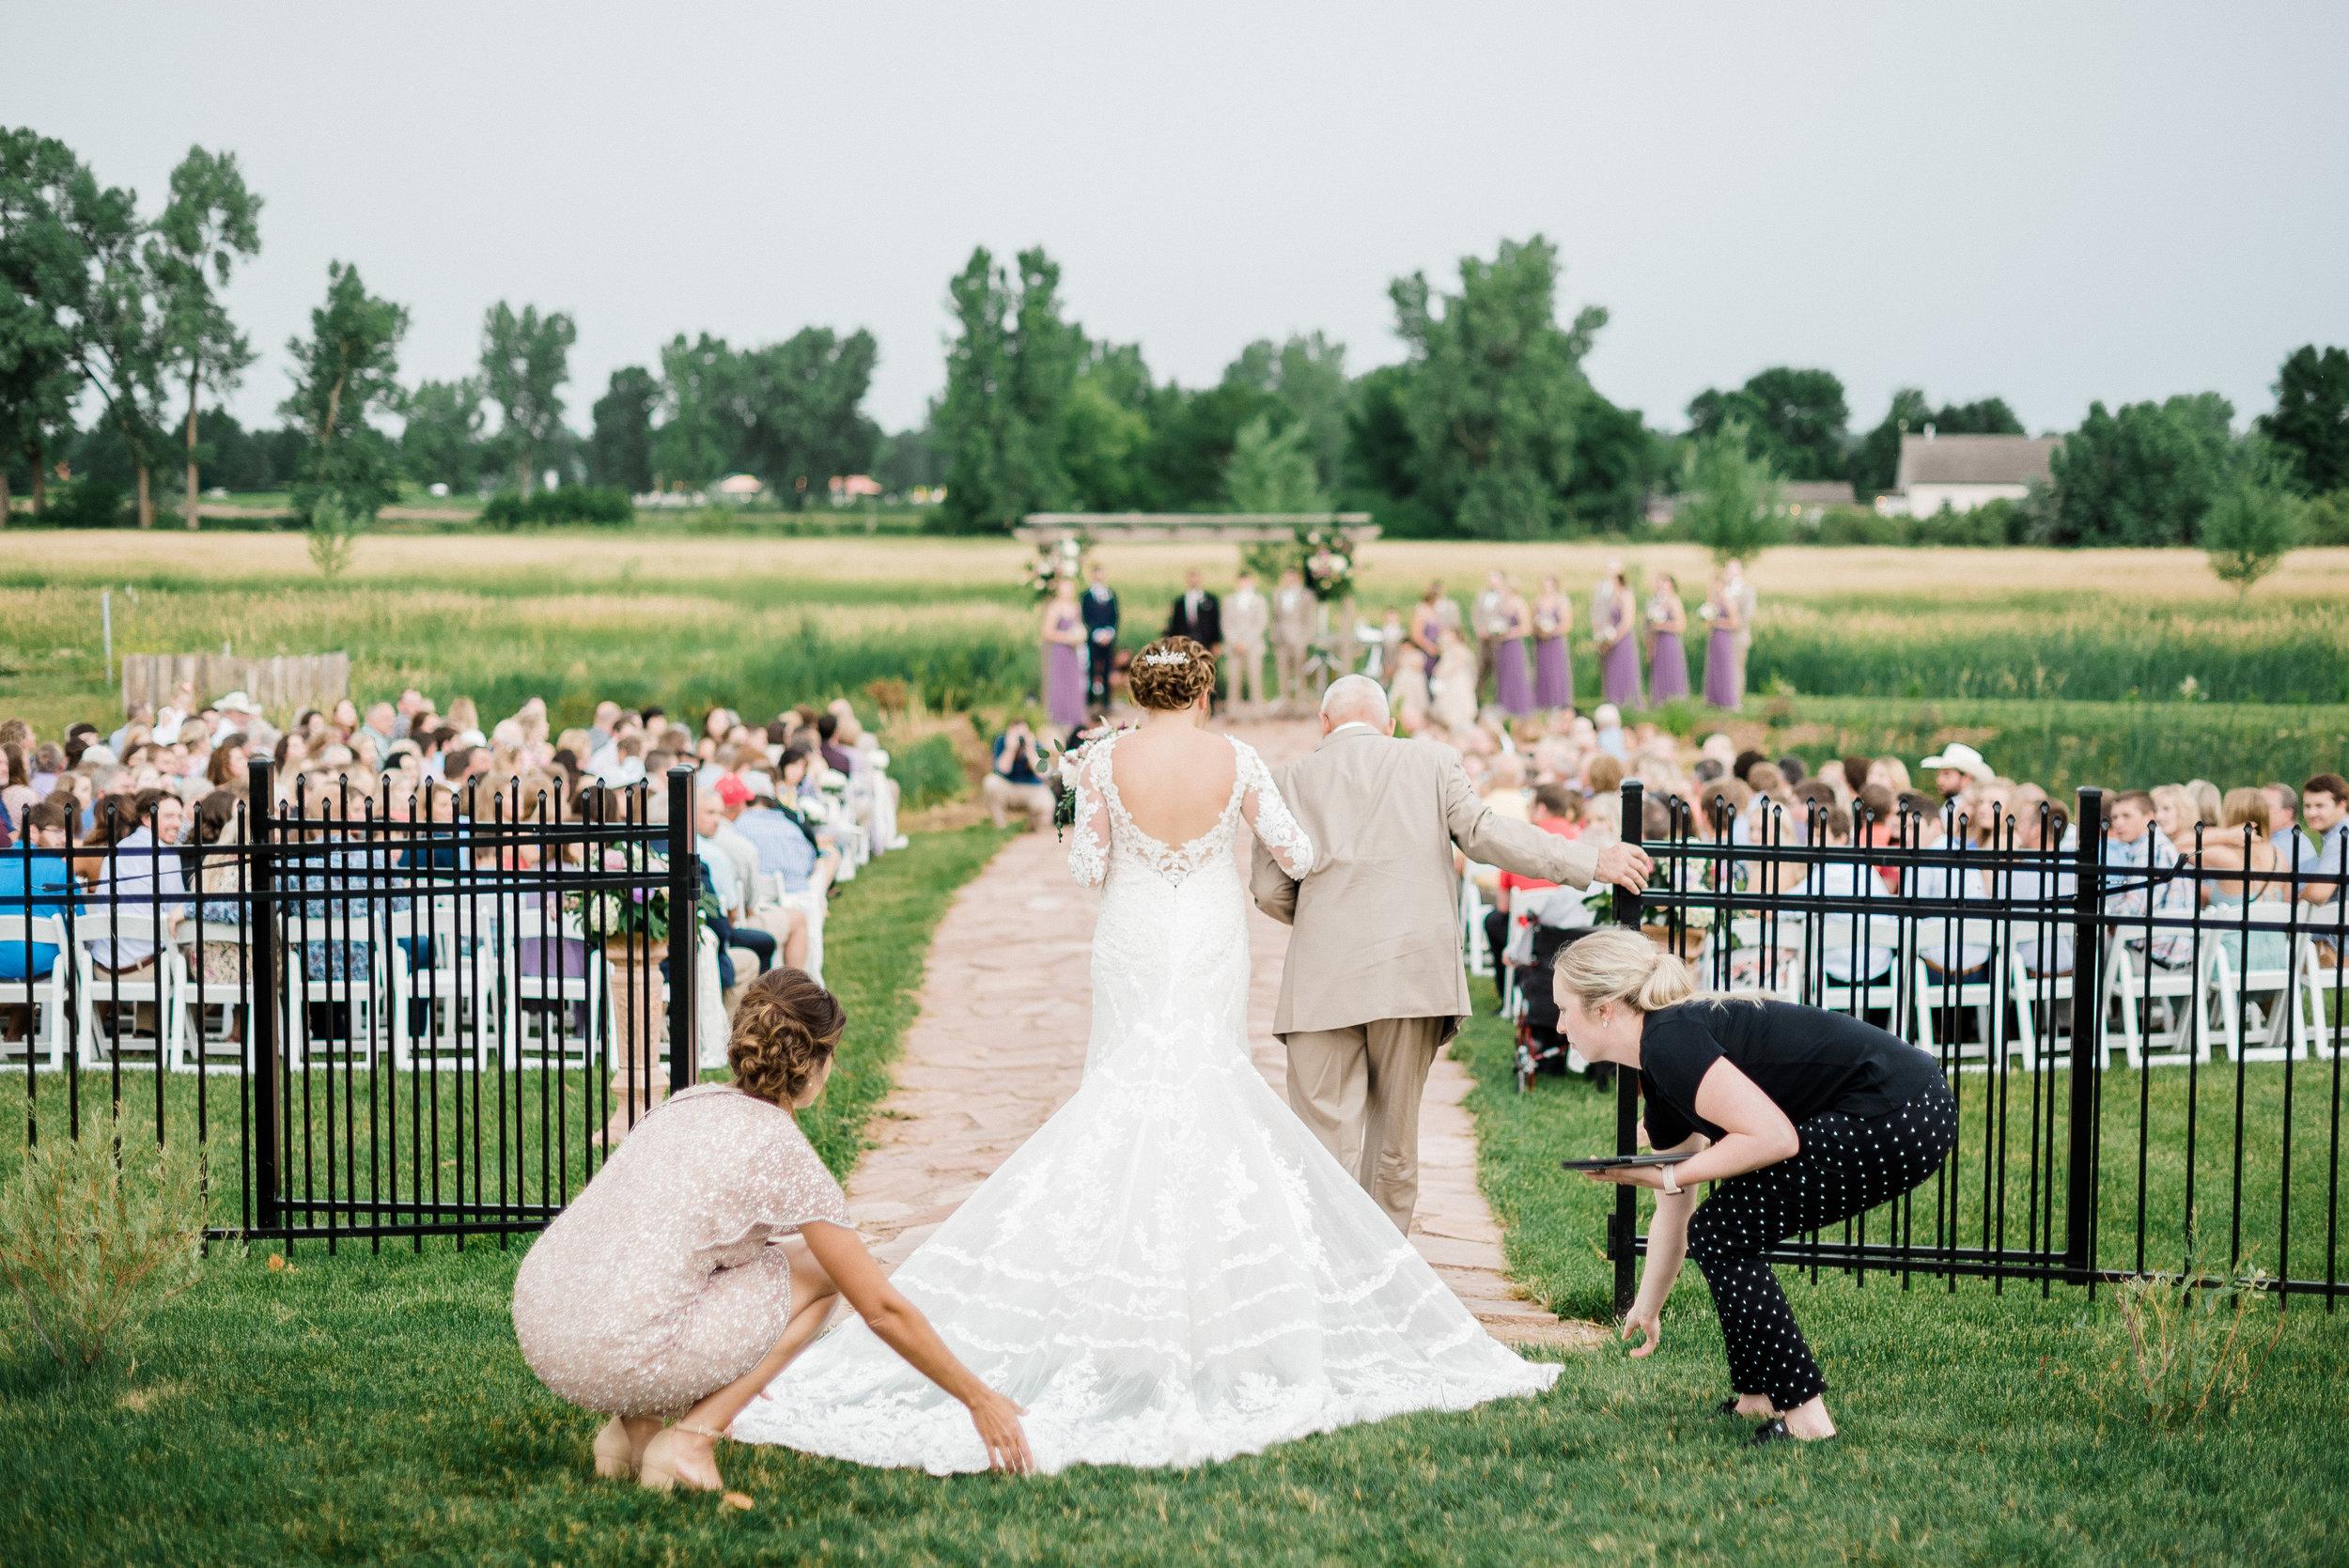 Micaela and Turner Wedding - 428 copy.jpg